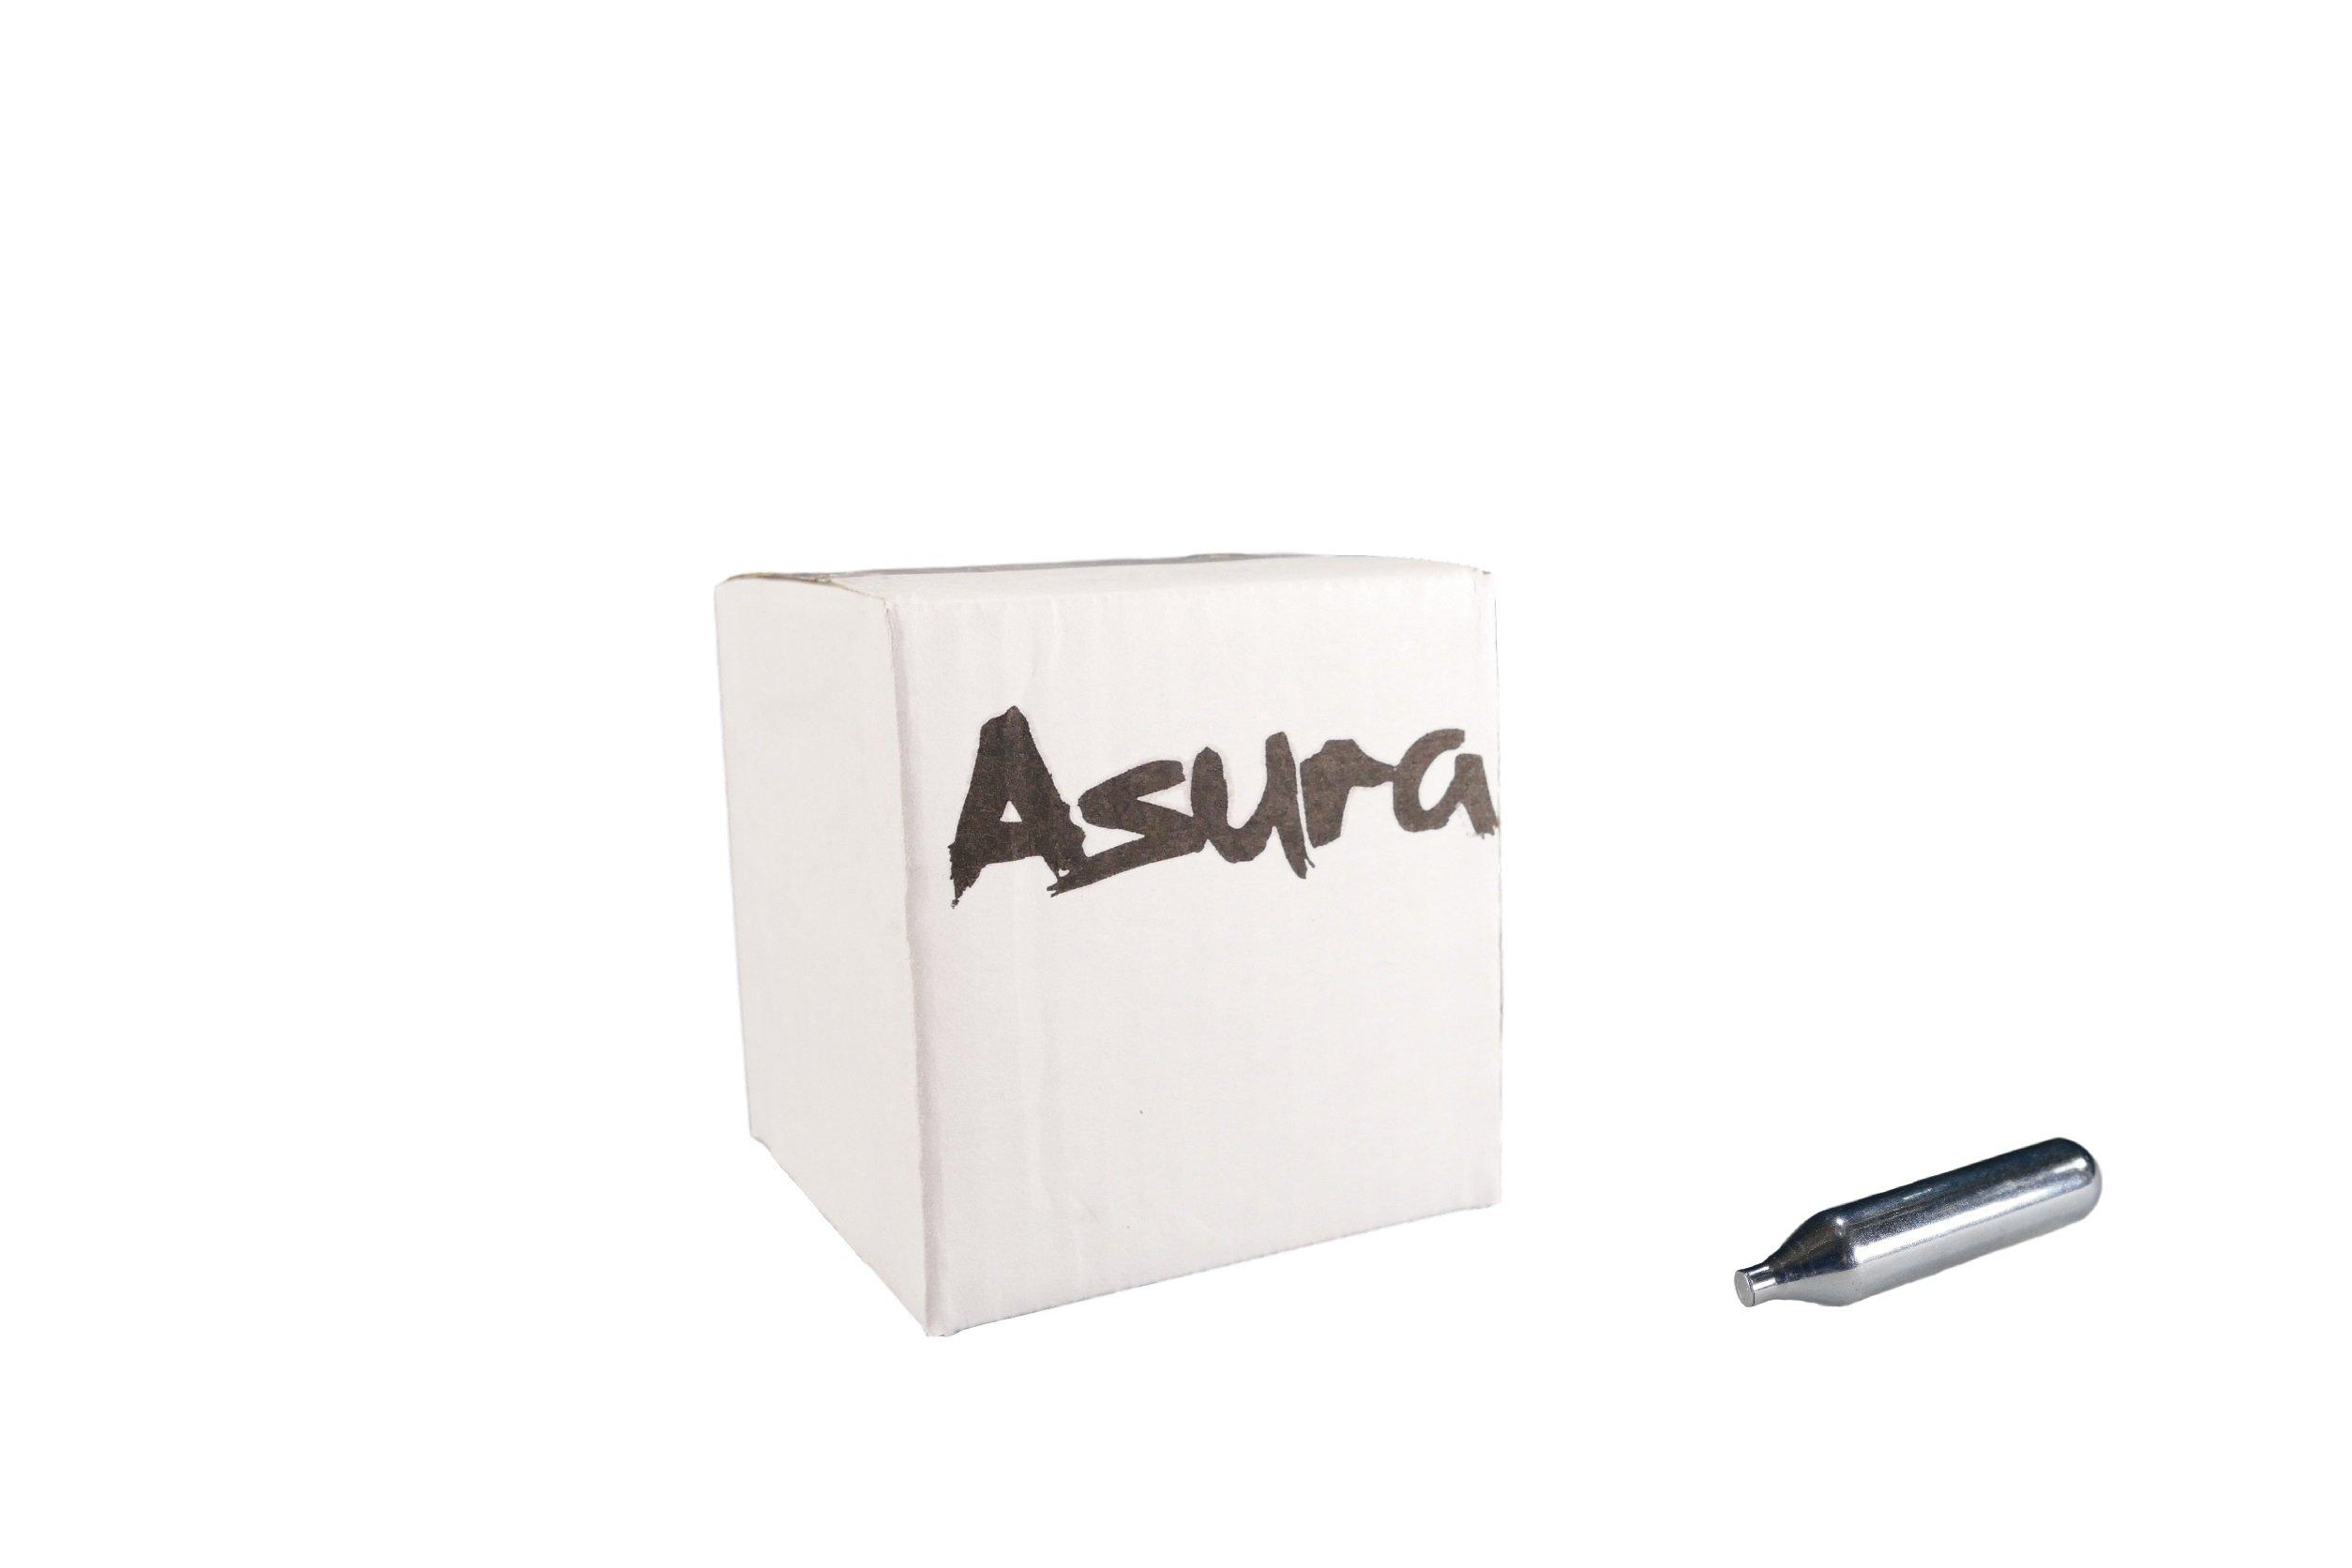 Asura 12g CO2 Cartridges - 15PK by Asura